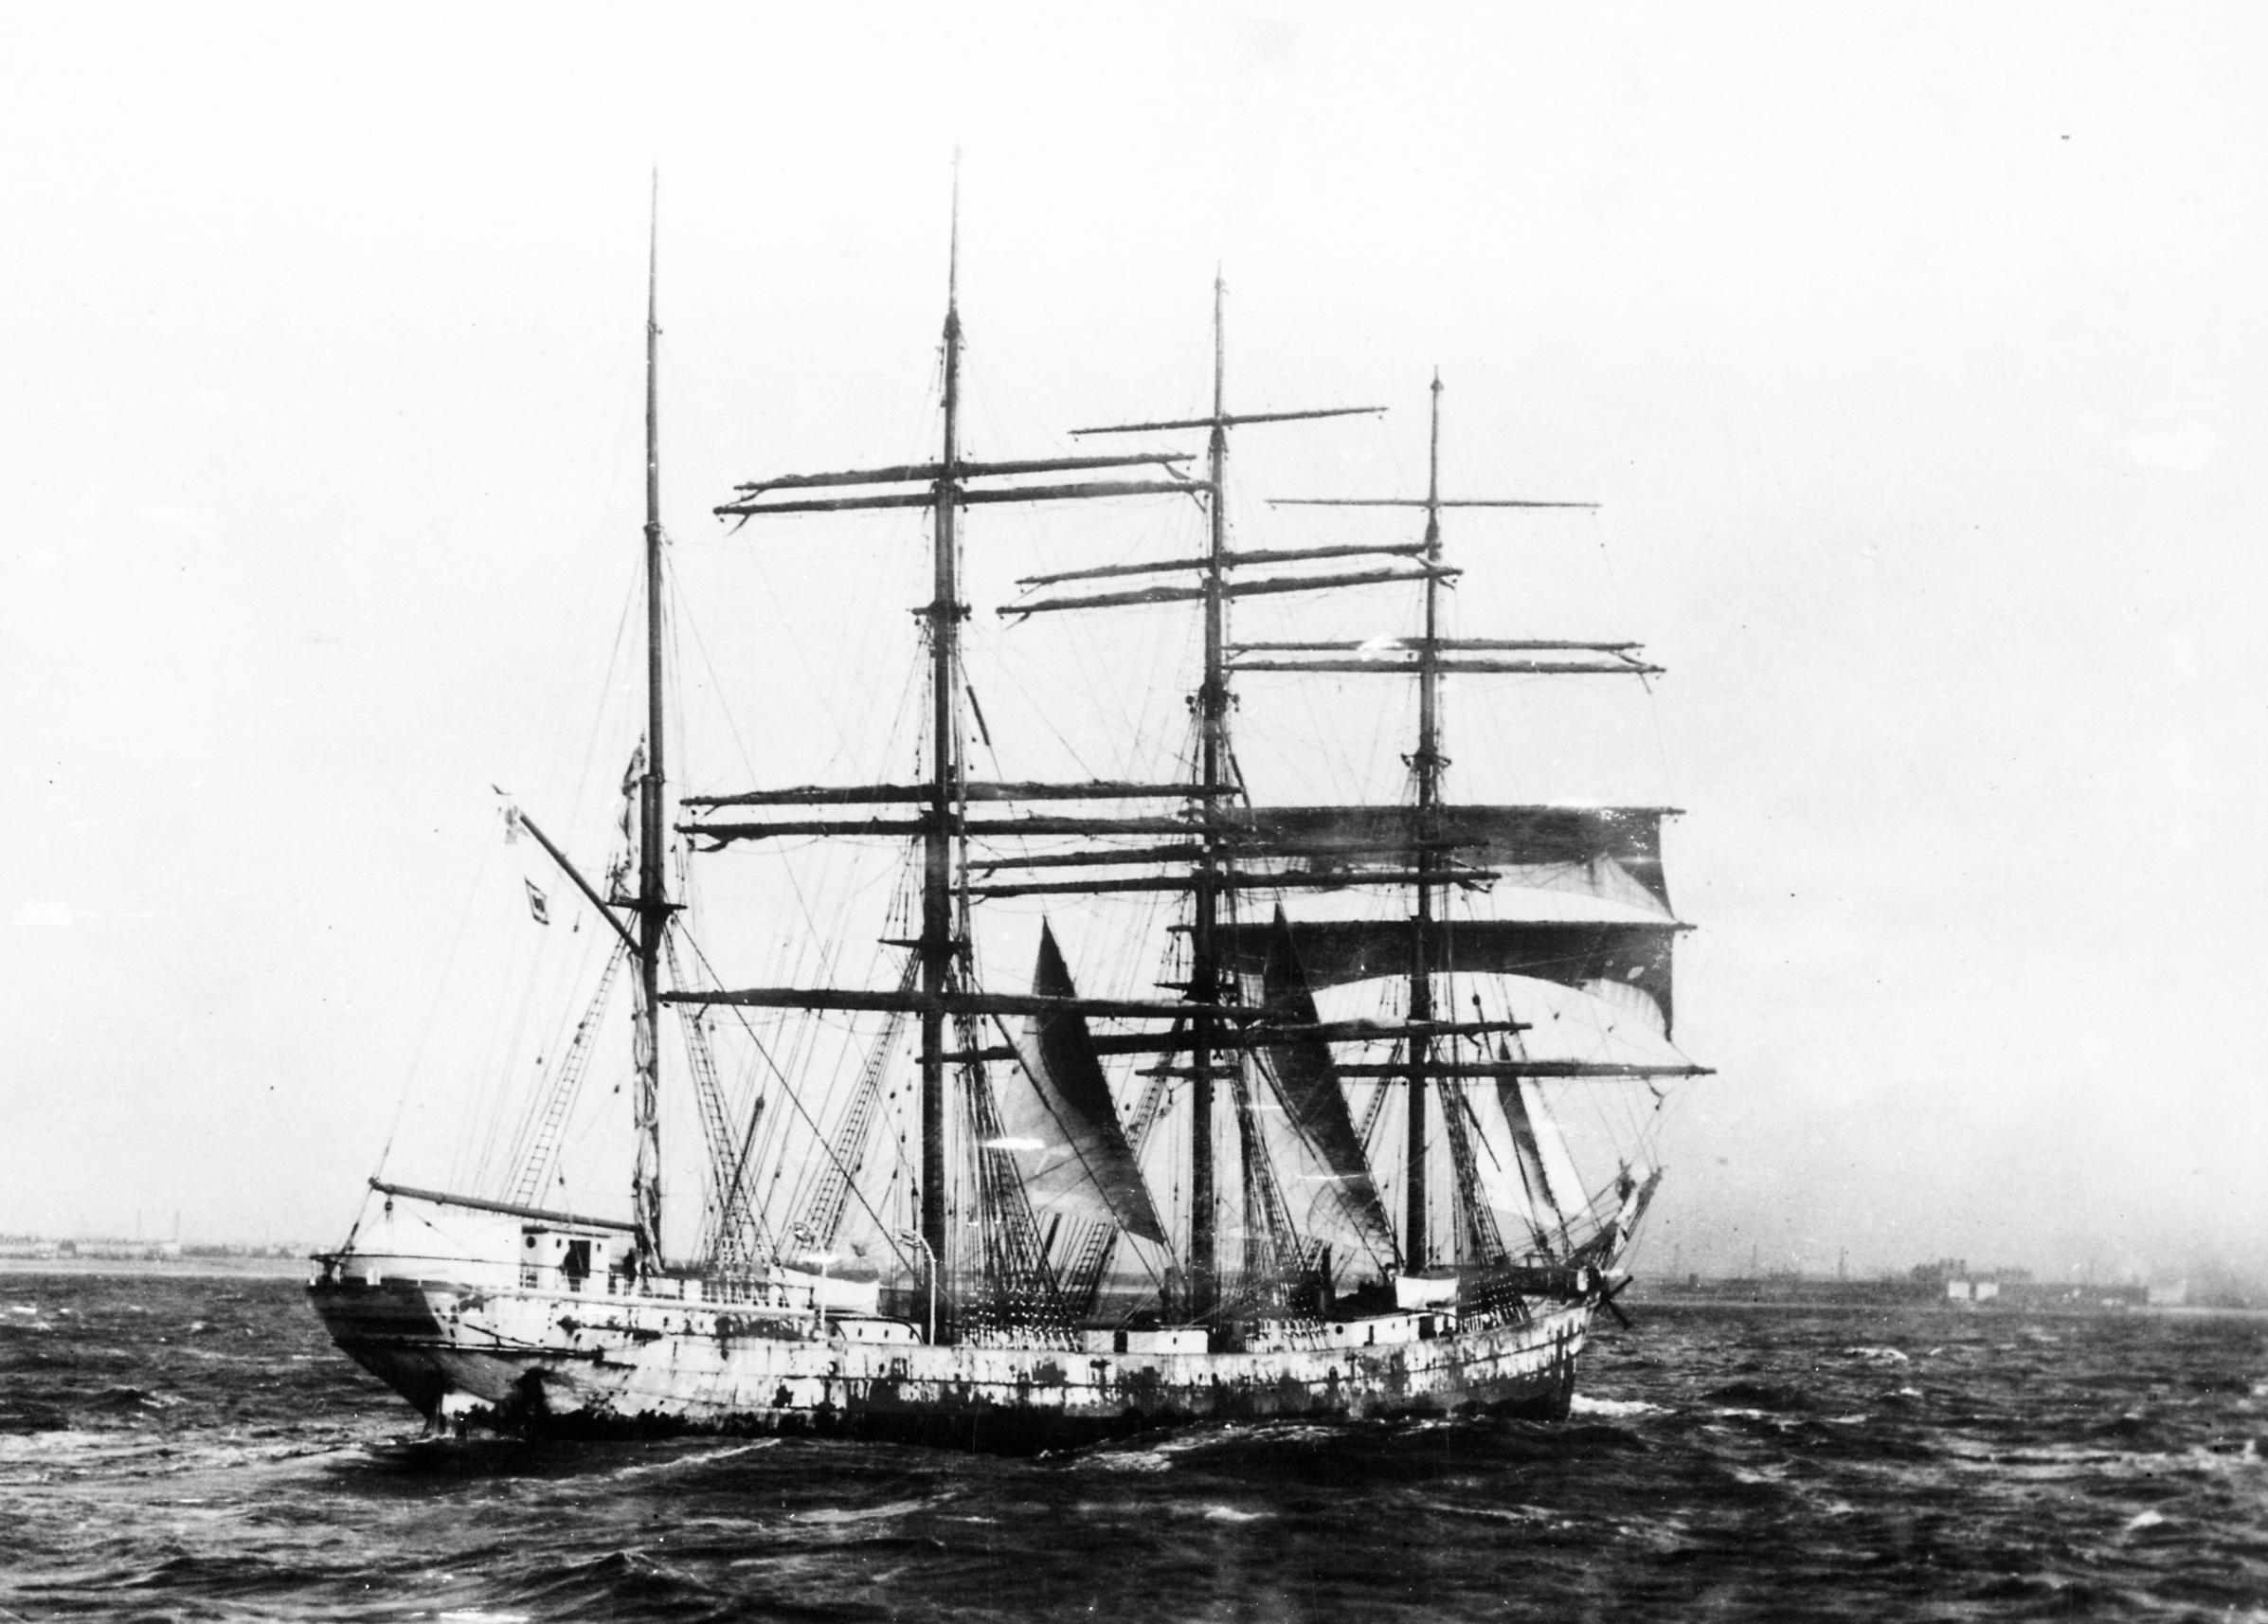 Olivebank_(ship,_1892)_-_SLV_H99.220-2499.jpg